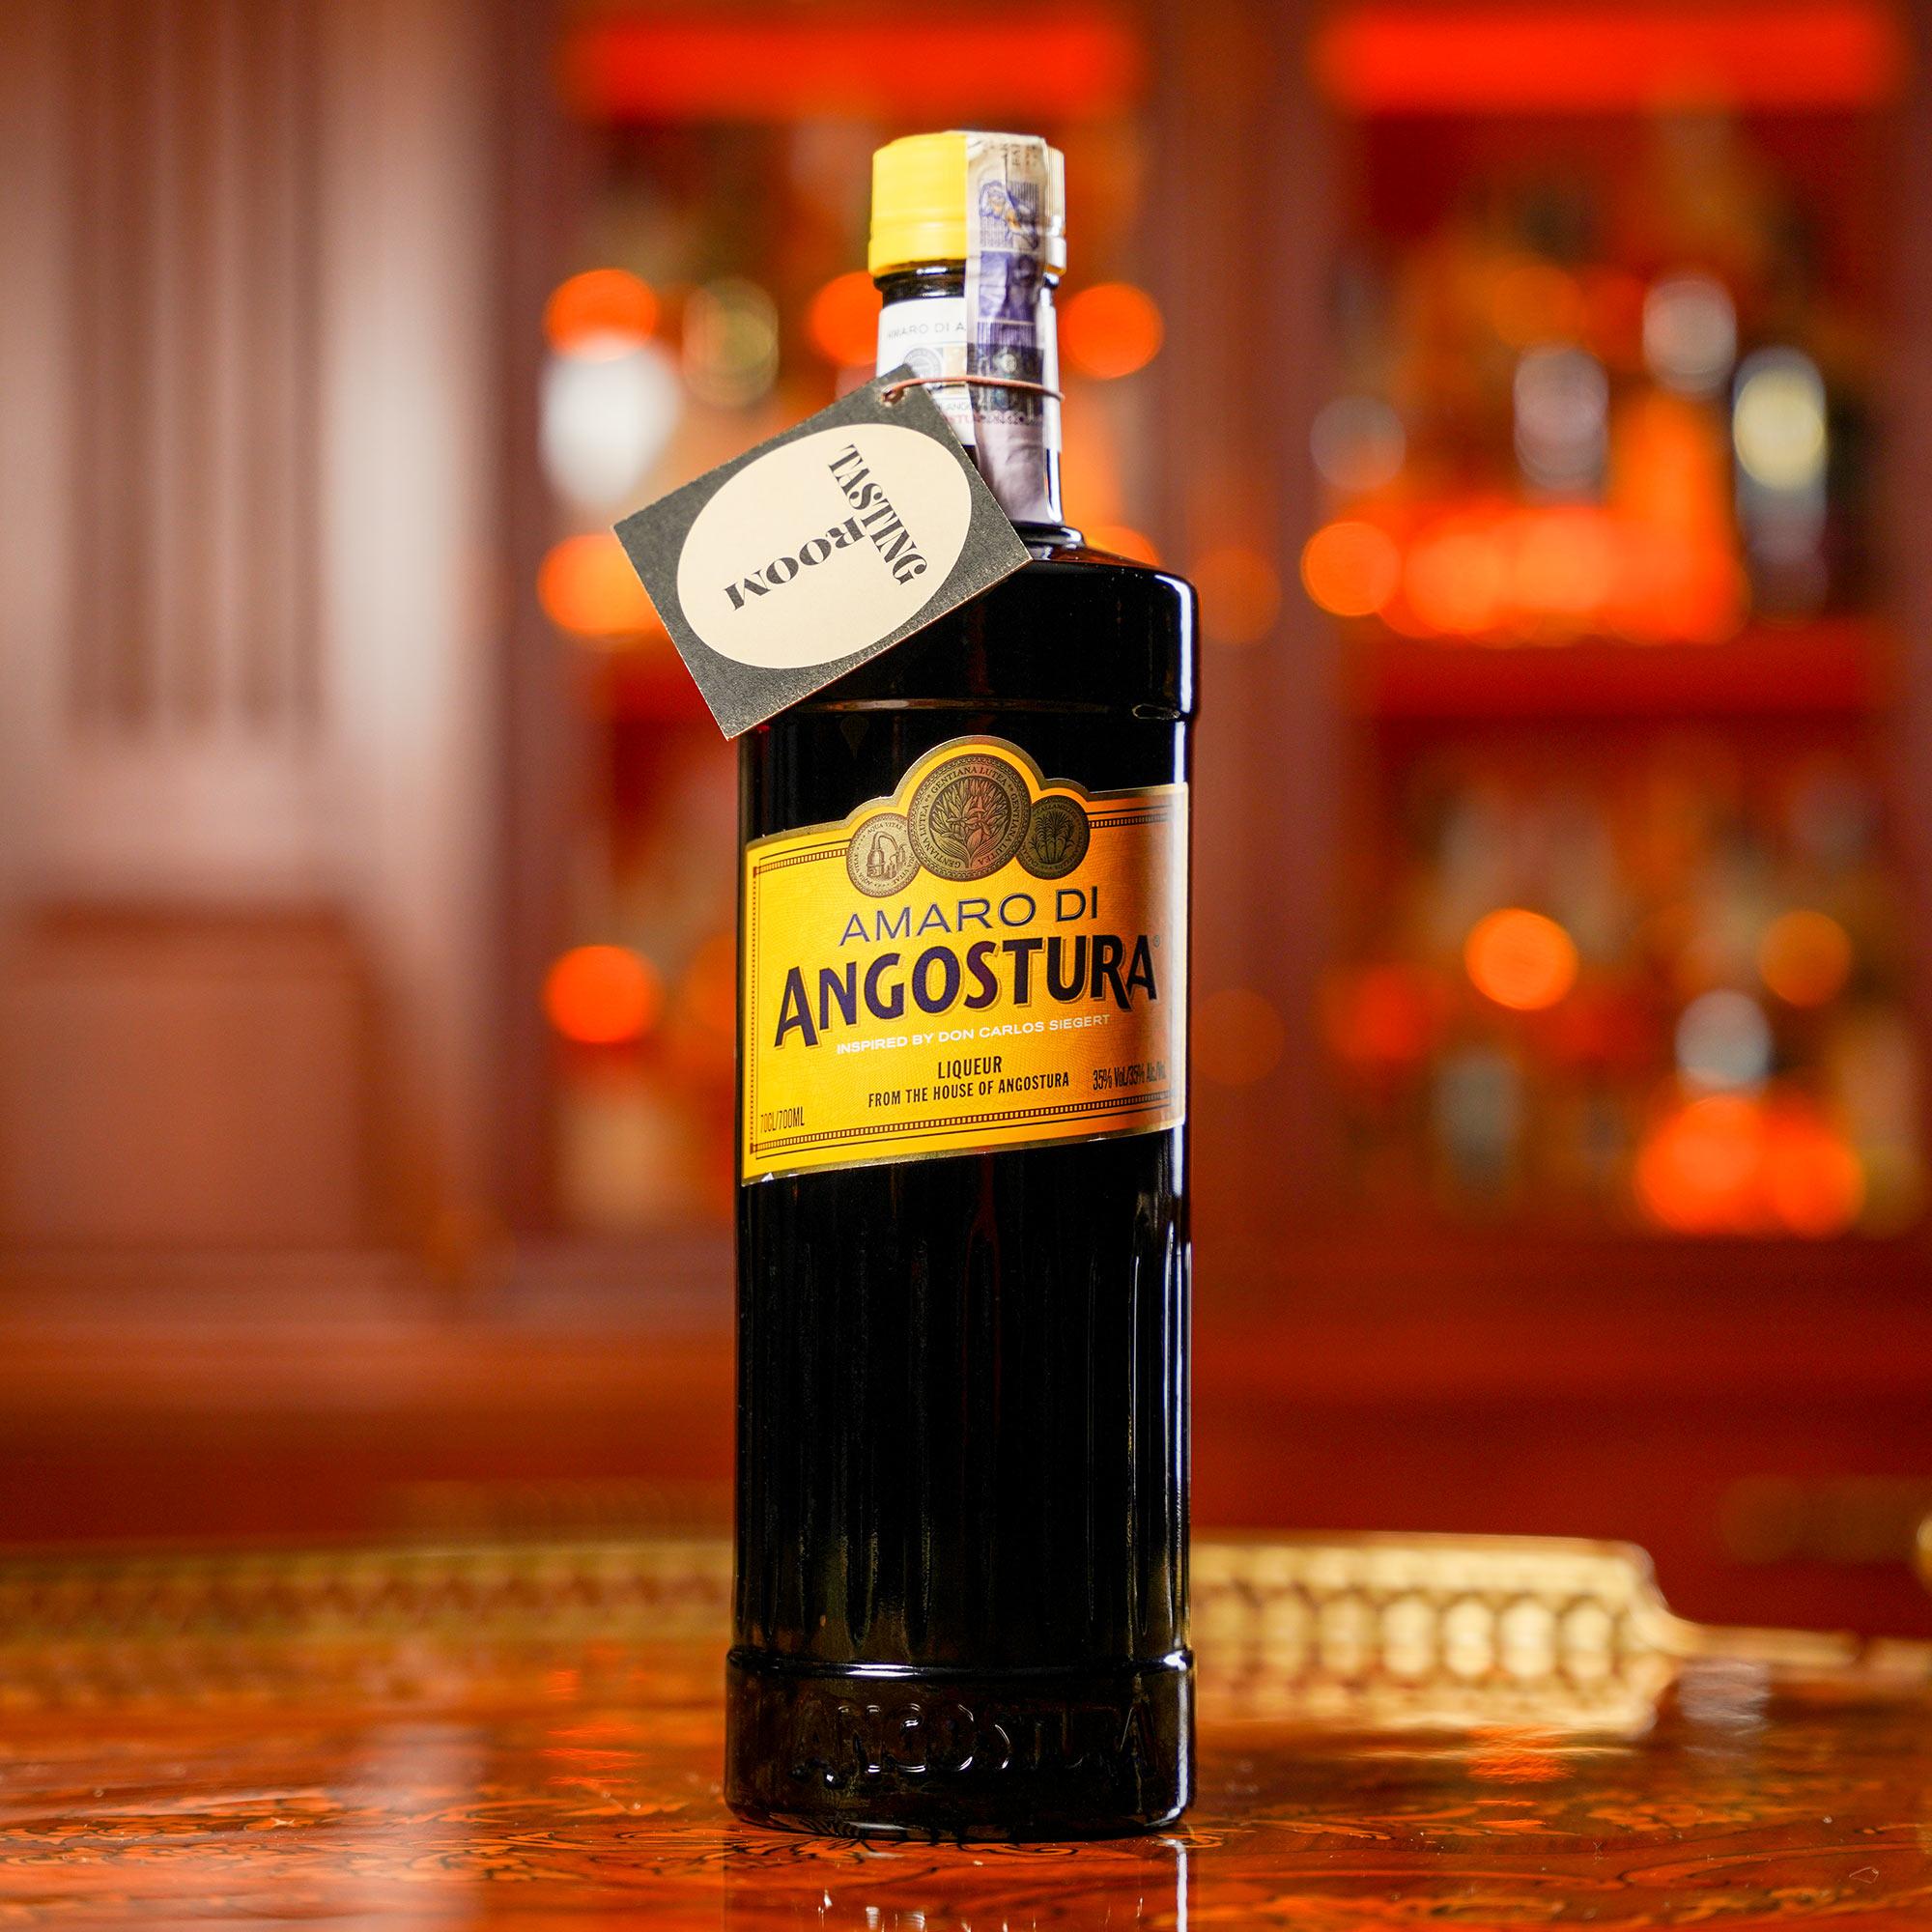 Amaro di Angostura /Амаро ди Ангостура